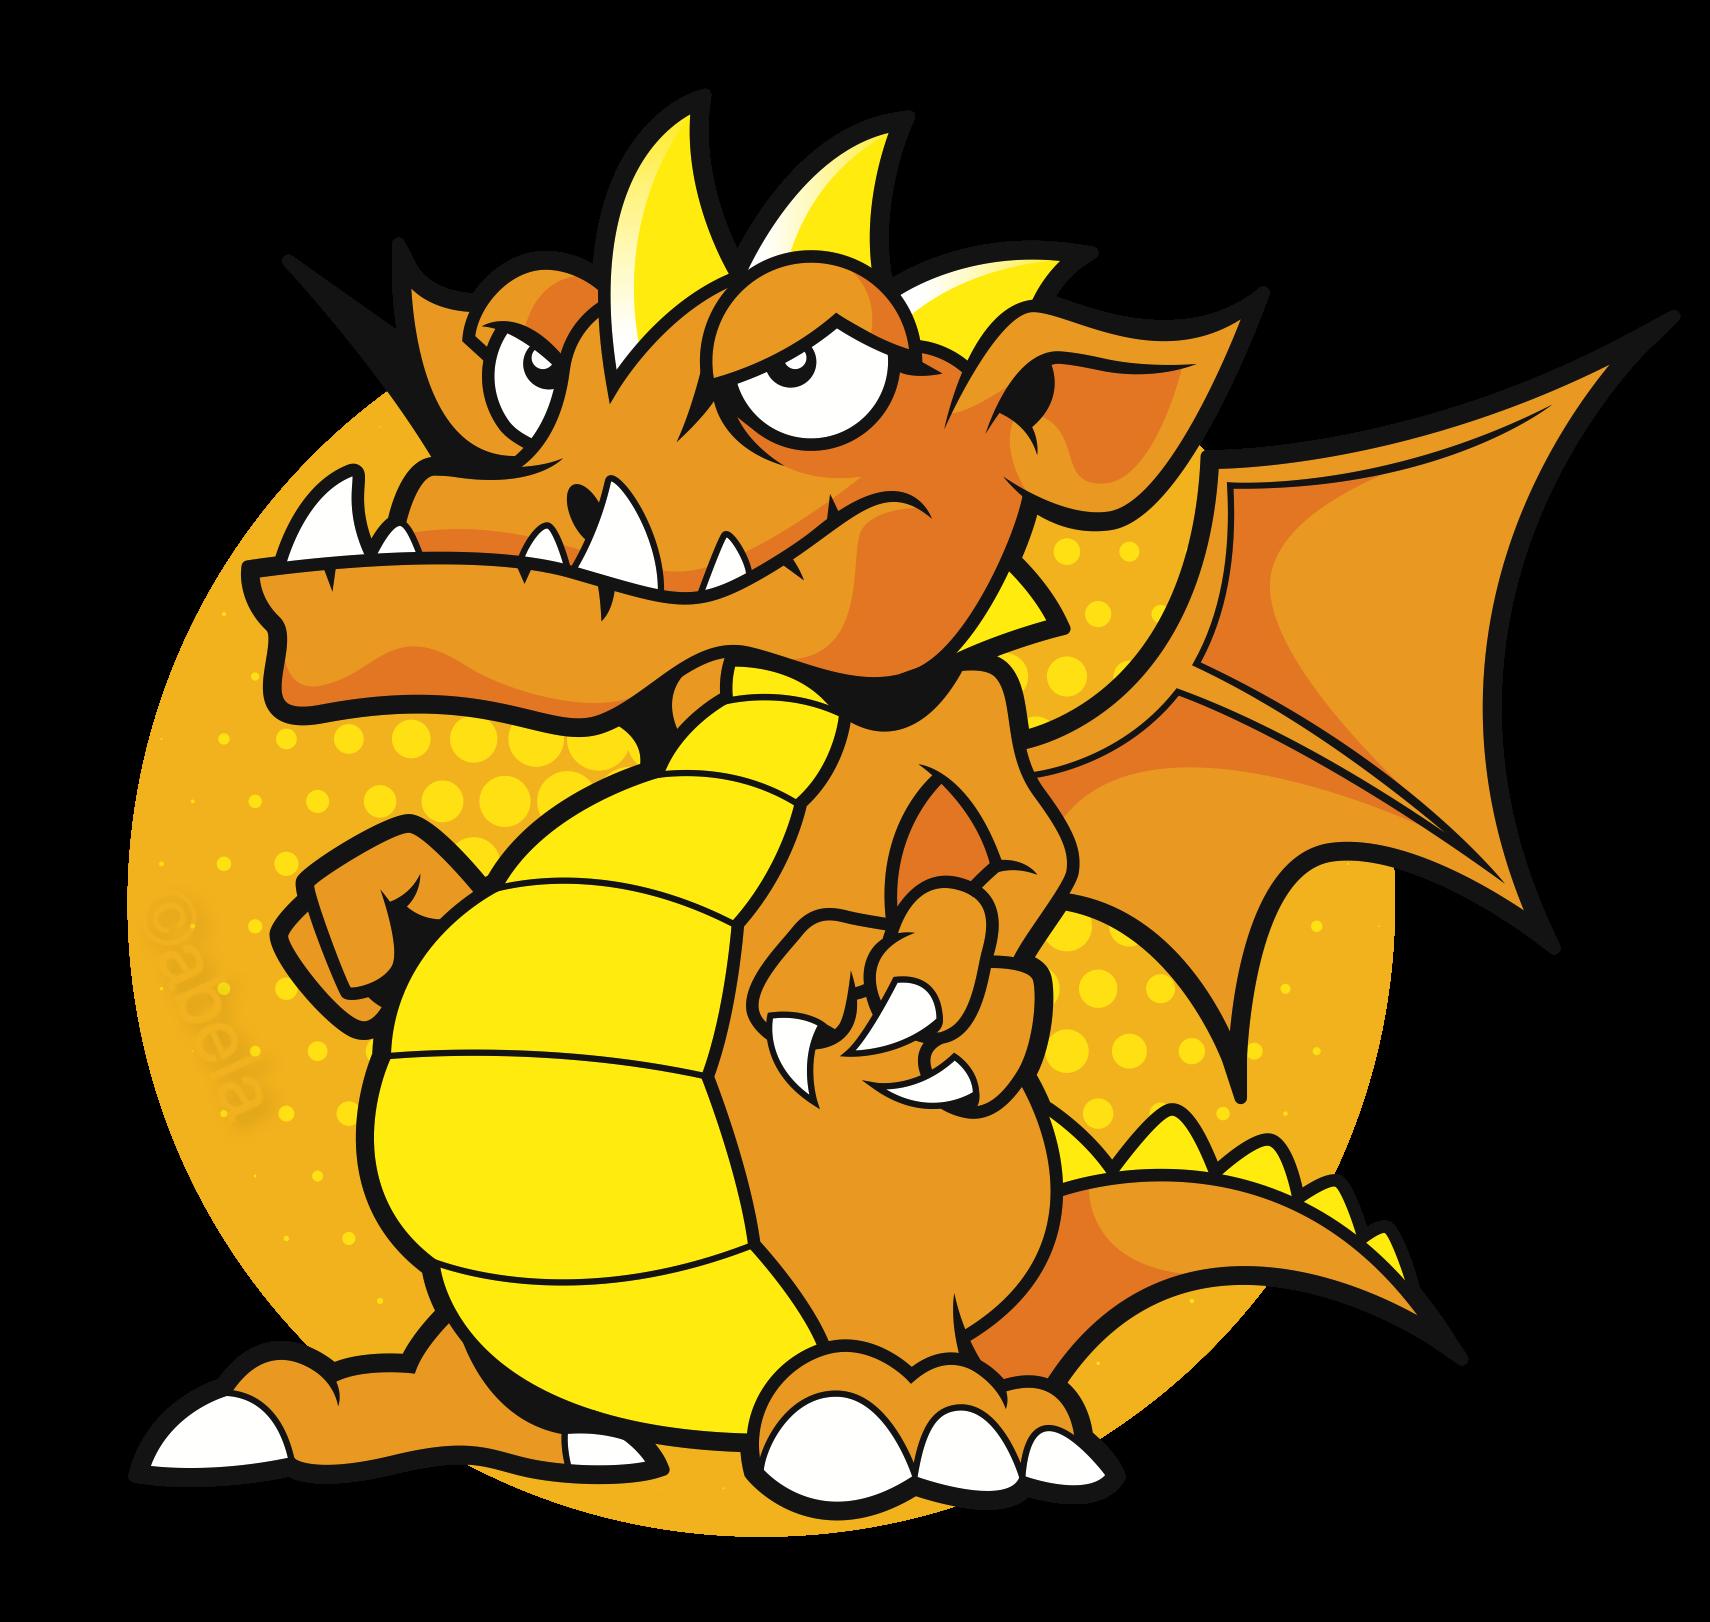 Clipart dragon yellow. North staffs mind